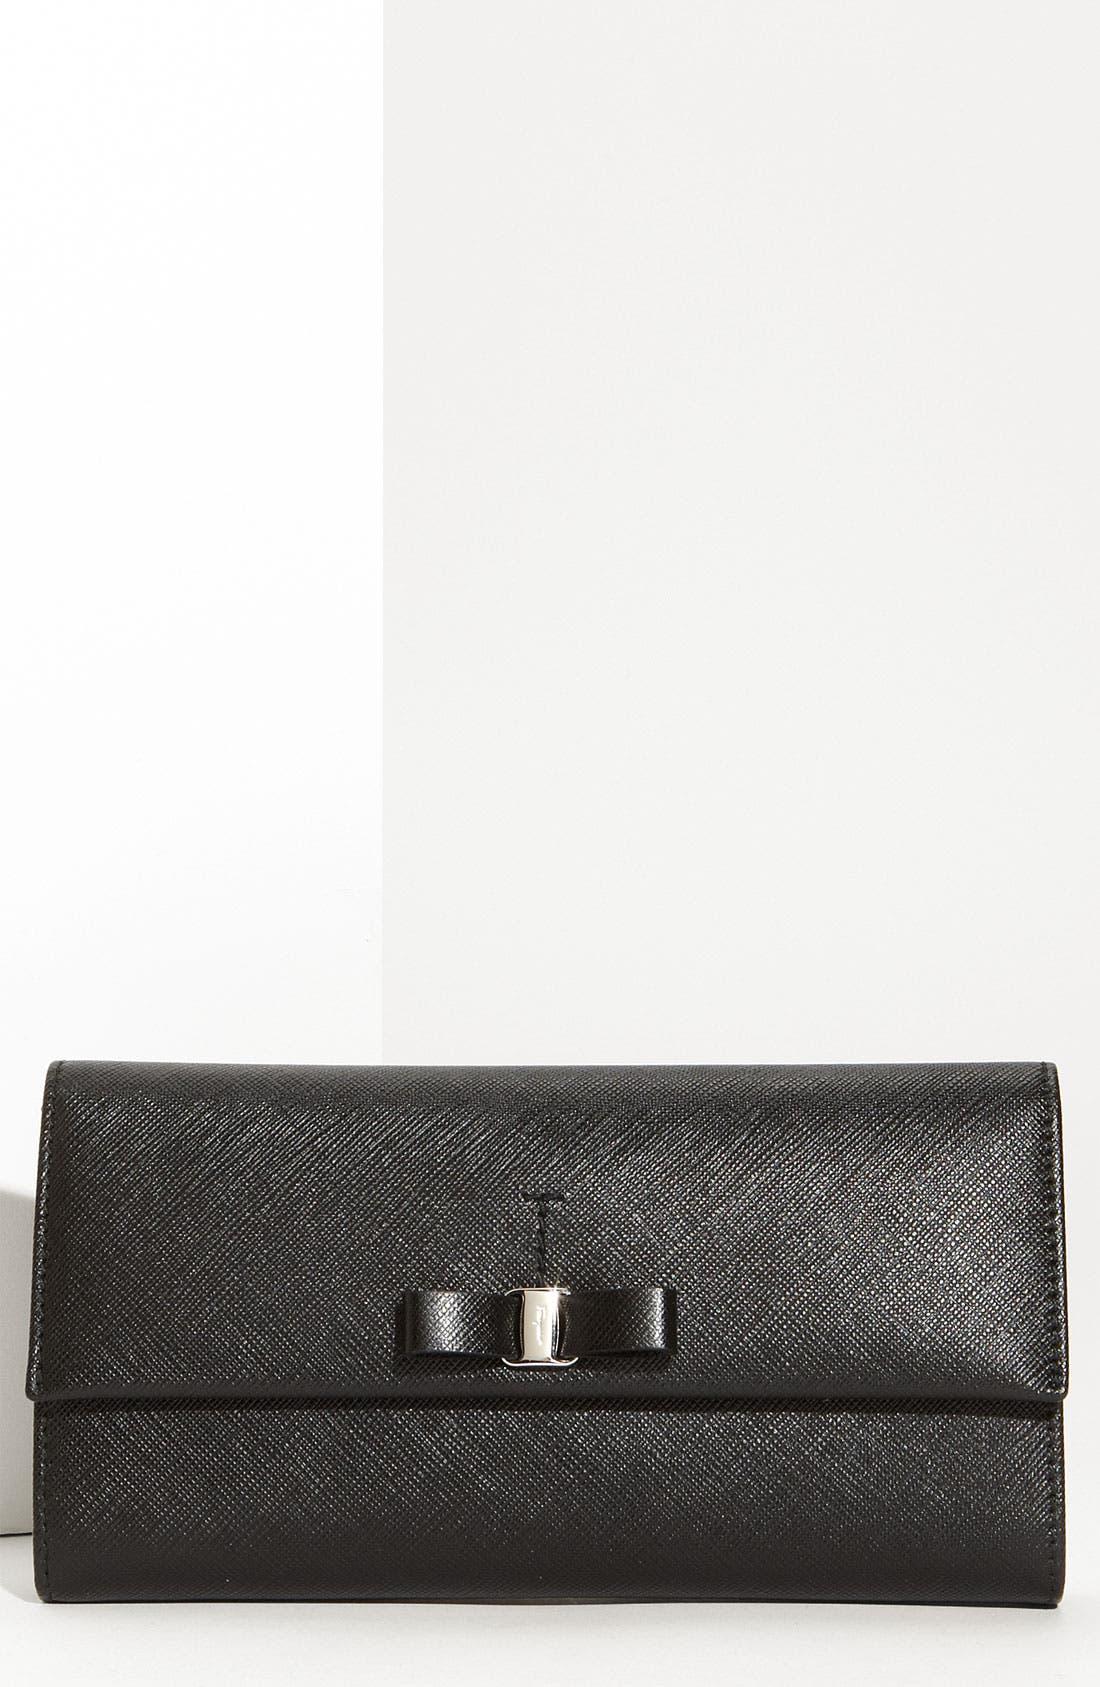 Alternate Image 1 Selected - Salvatore Ferragamo 'Vara' Continental Wallet